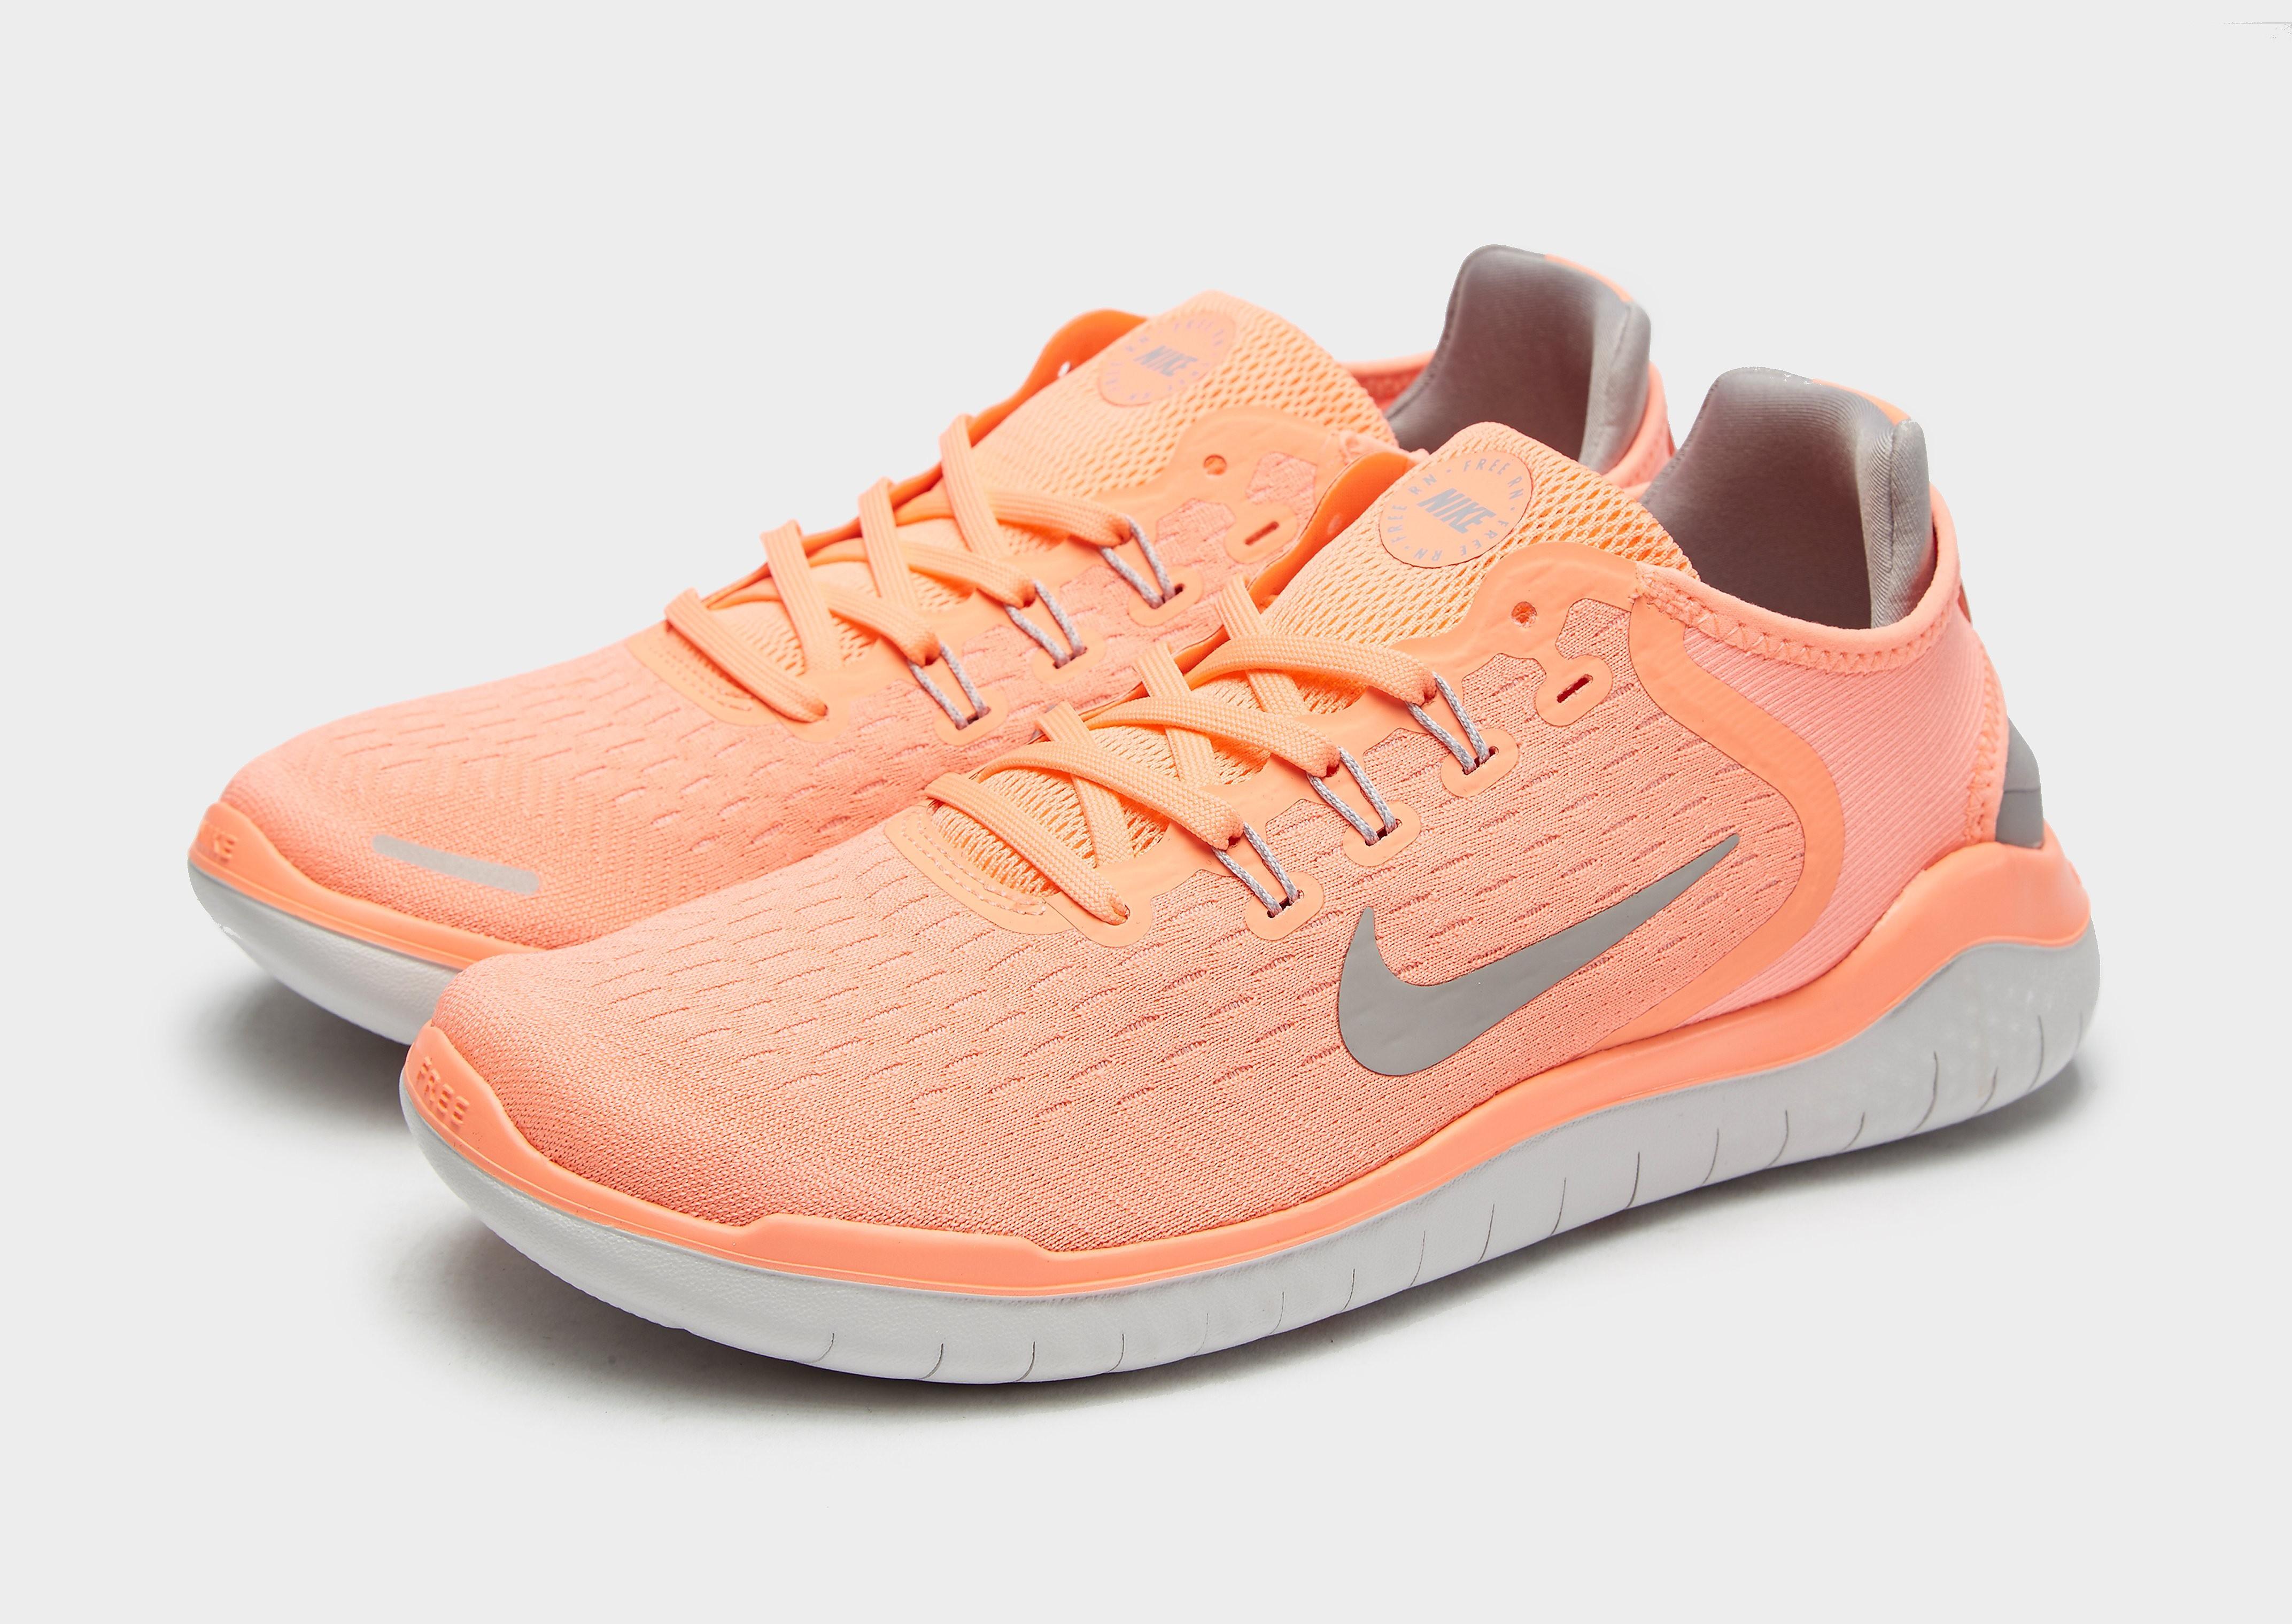 Nike Free RN 2018 Women's